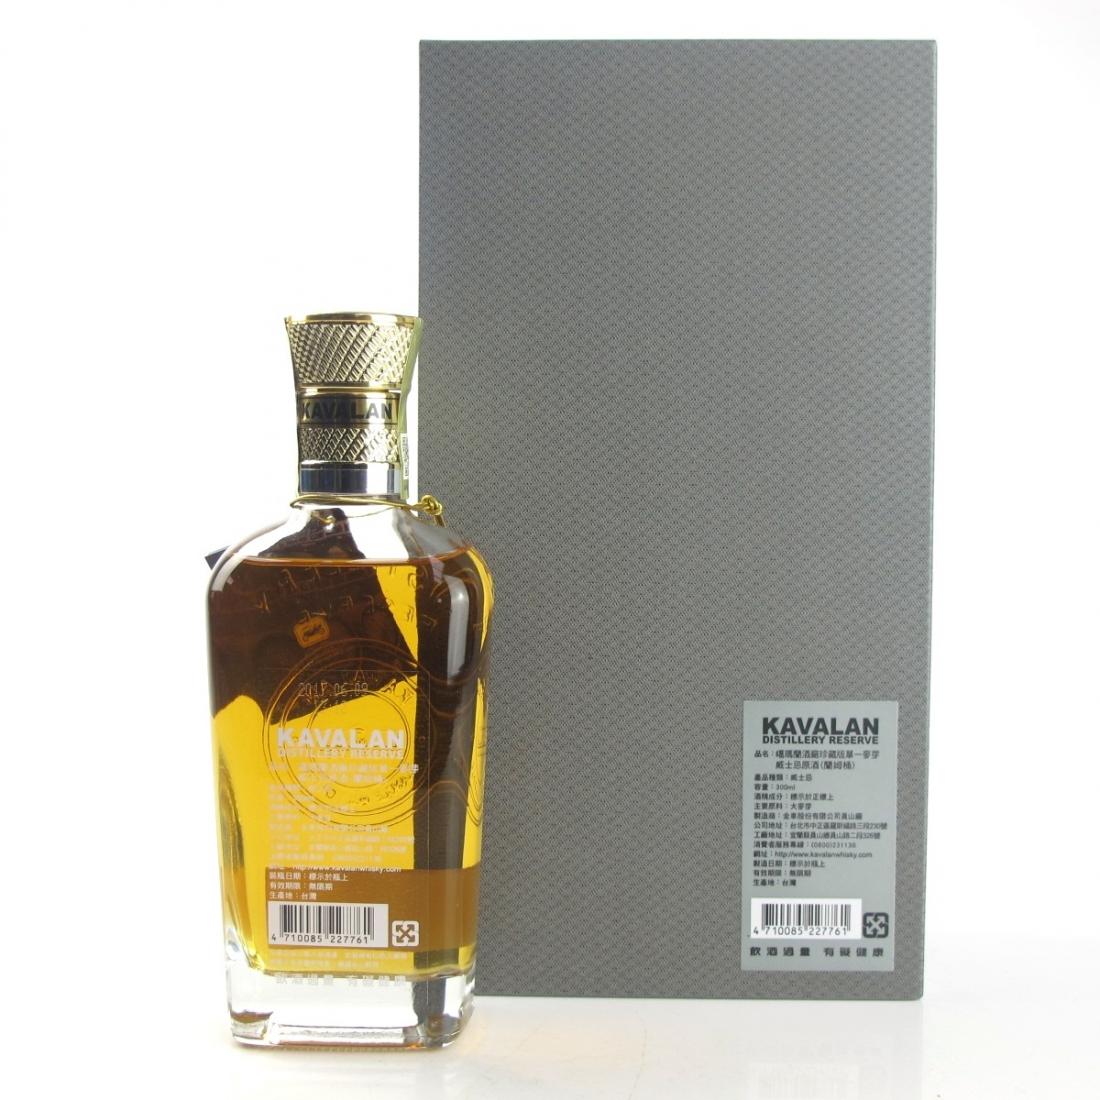 Kavalan Distillery Reserve 30cl / Rum Cask 57.8%